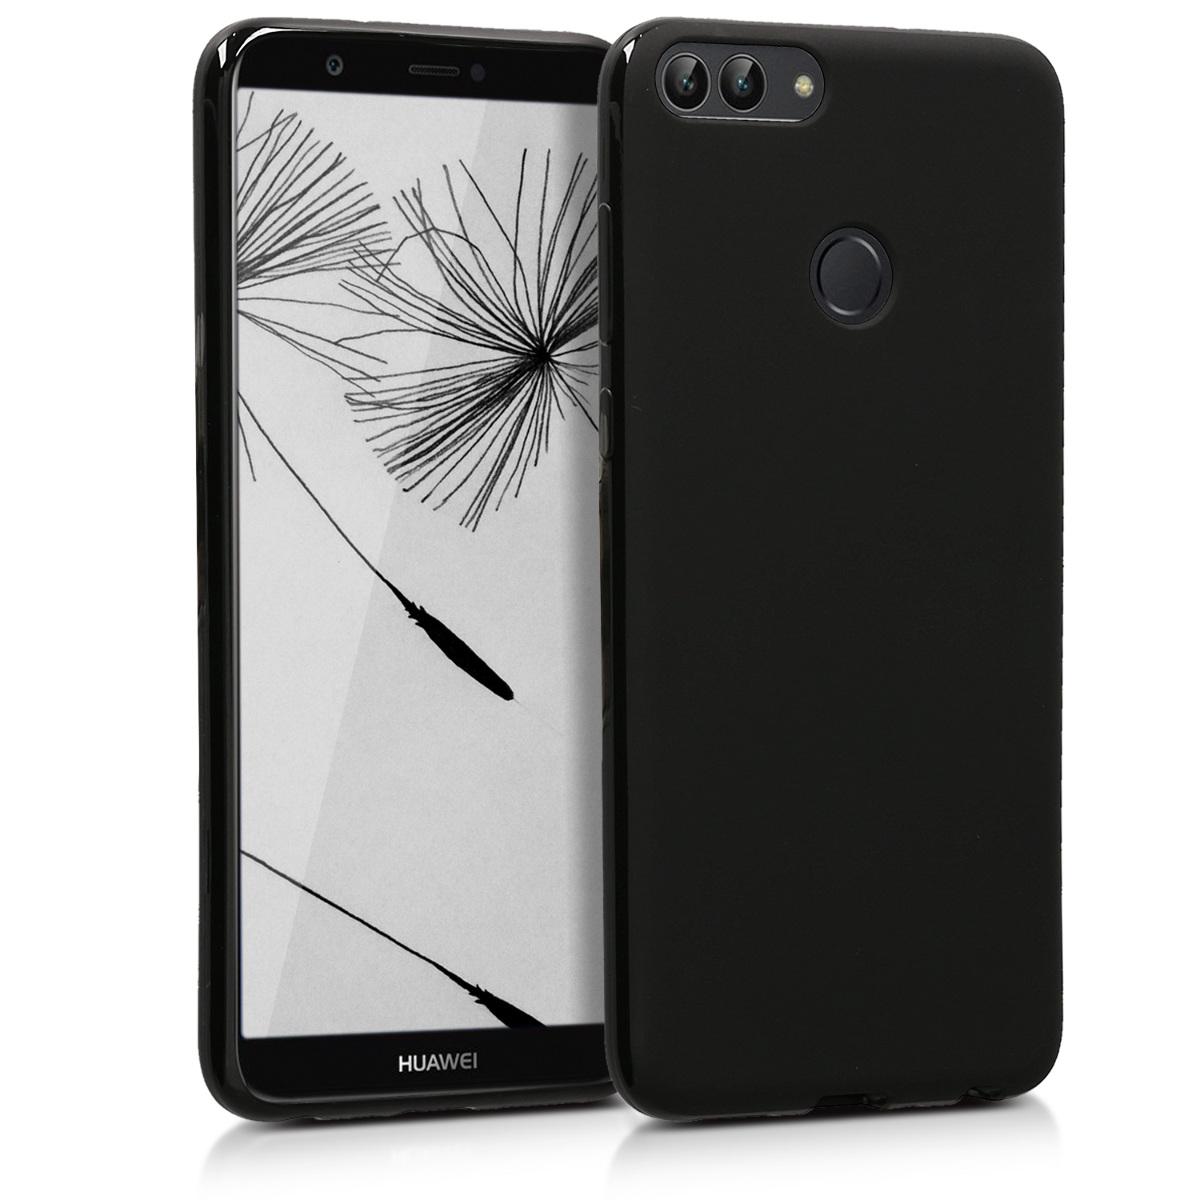 KW Θήκη Σιλικόνης Huawei P Smart 2018 - Black Matte (44124.47)